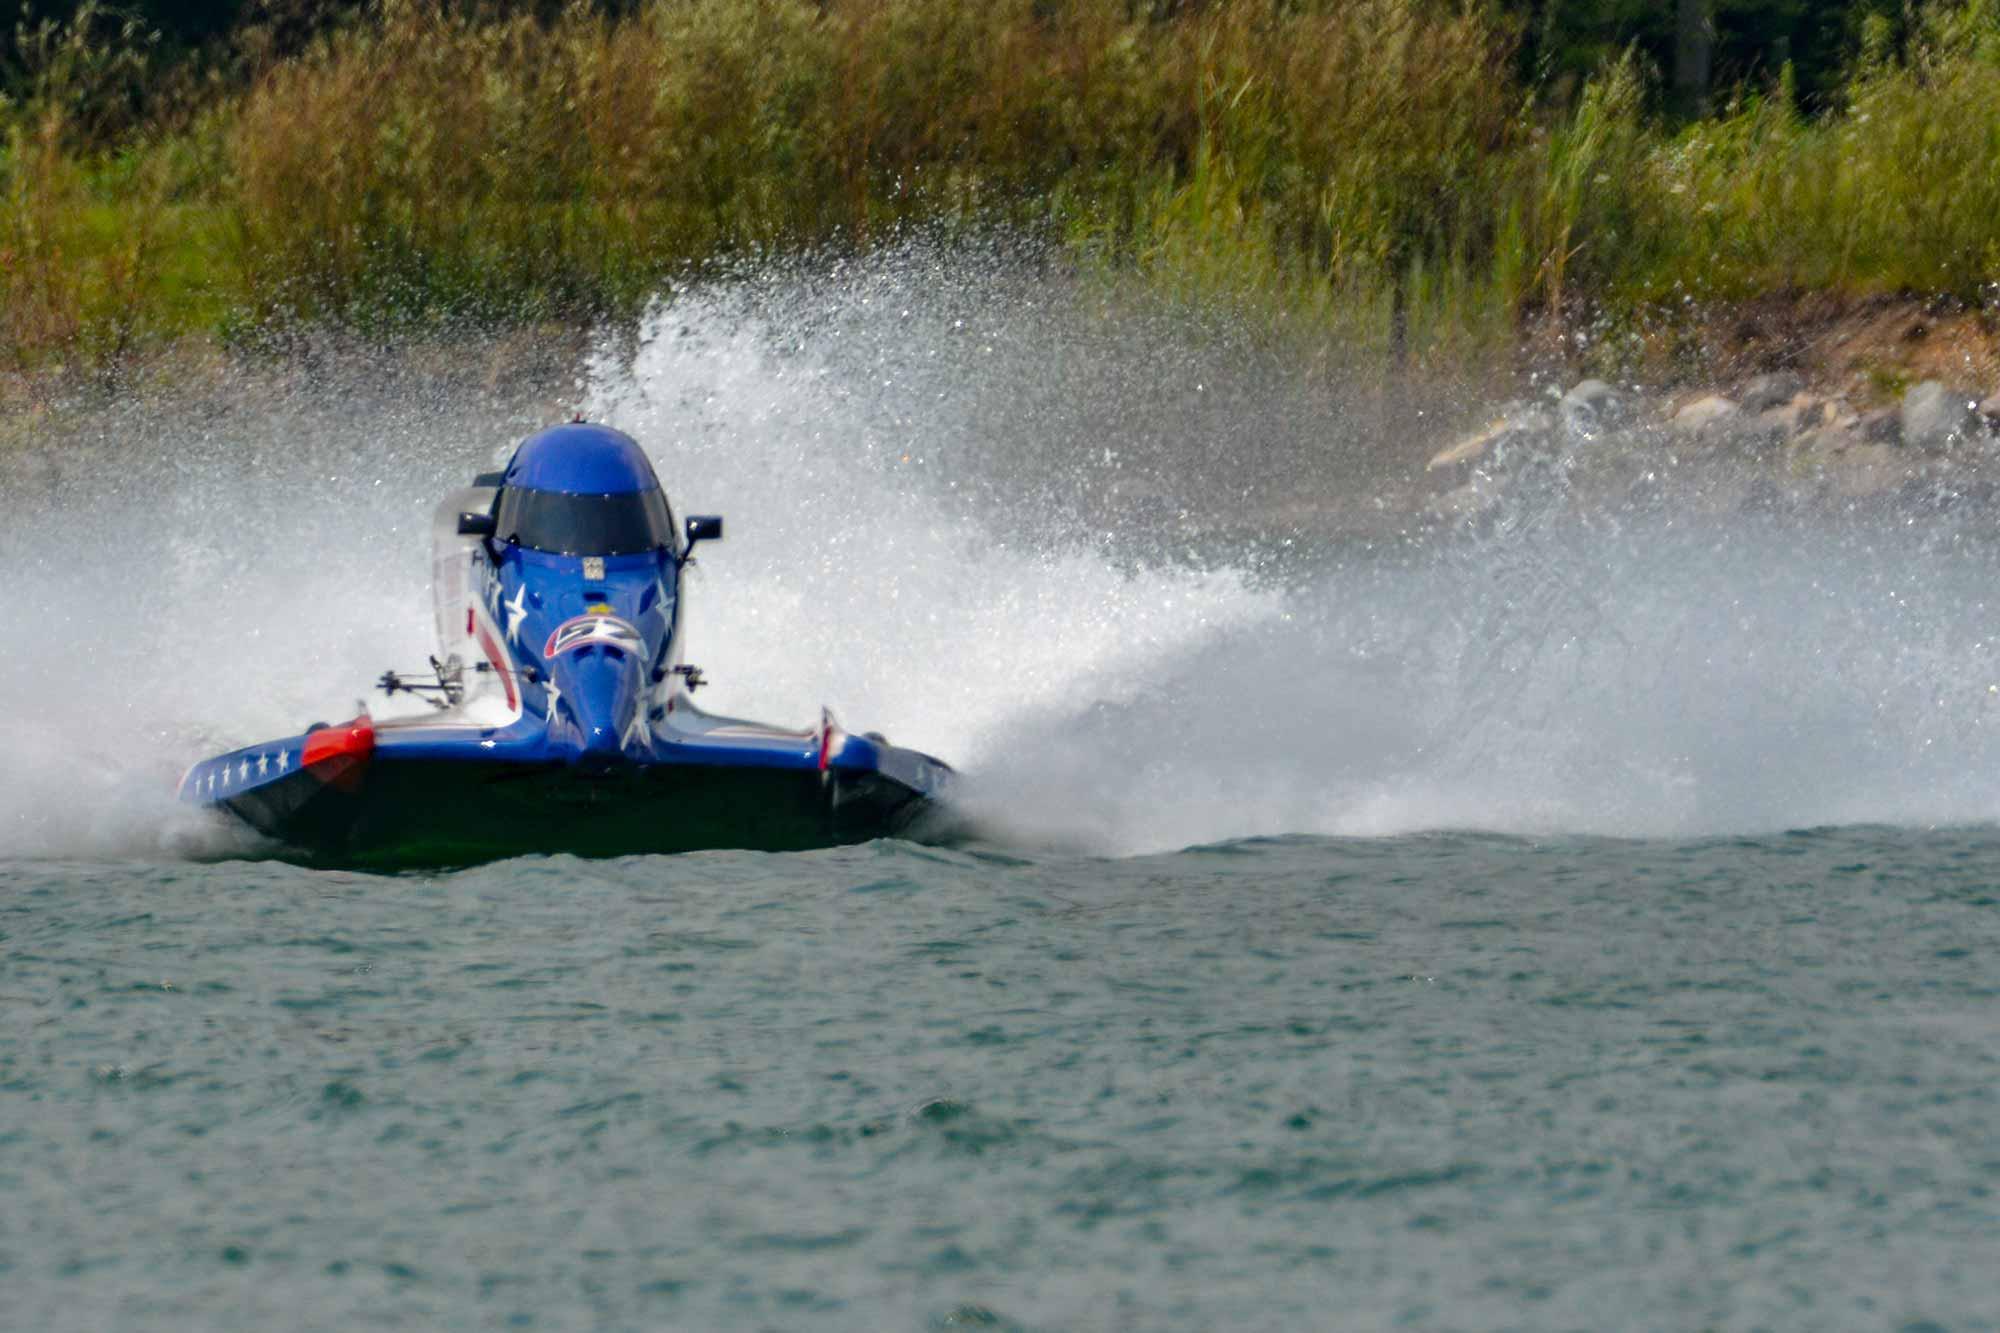 McMurray-Racing-Nashvill-Marine-2021-Springfield-F1-Race-10